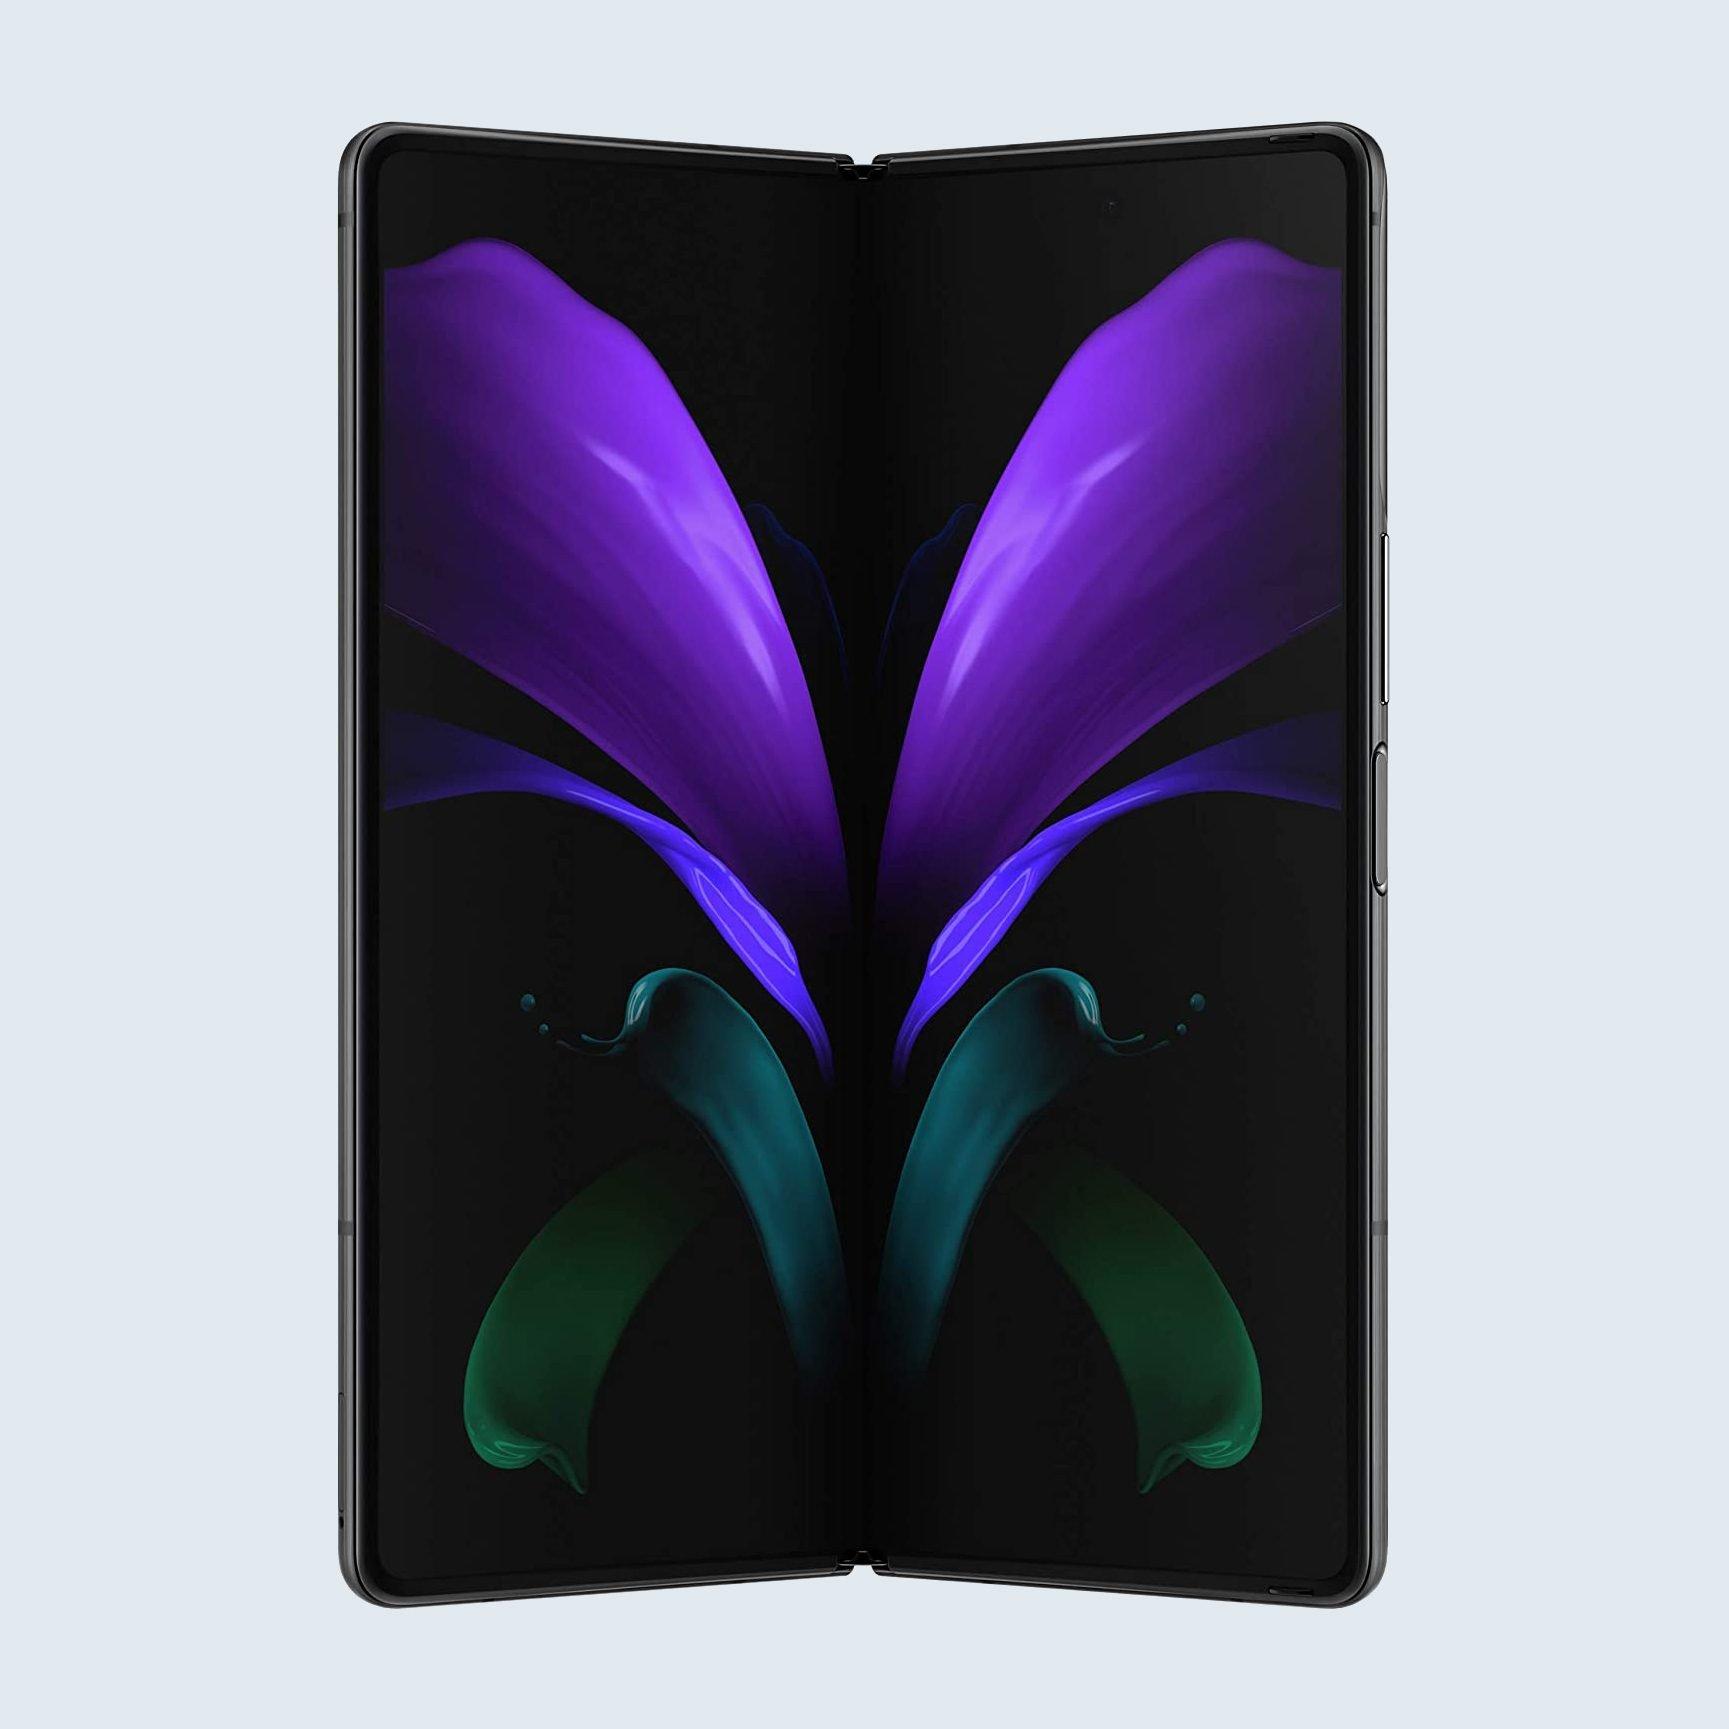 Samsung Galaxy Z Fold 2 5G Cell Phone on amazon warehouse